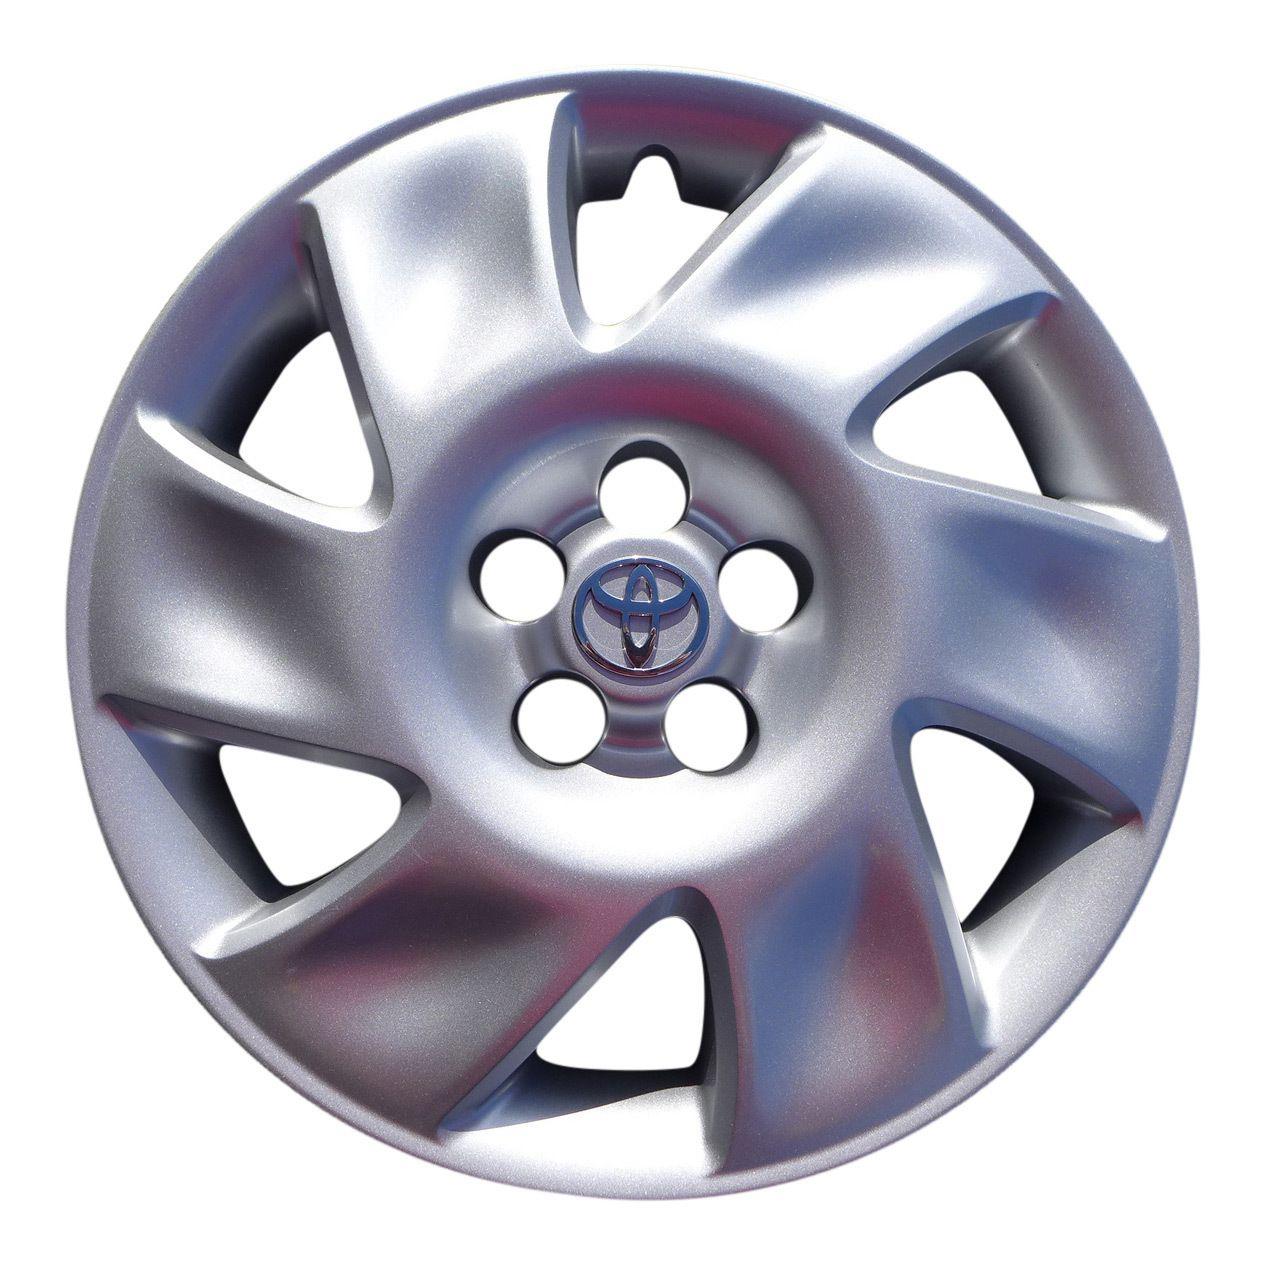 Brand new 2003 2004 toyota matrix hubcap wheel cover 16 61120 brand new 2003 2004 toyota matrix hubcap wheel cover 16 61120 publicscrutiny Gallery